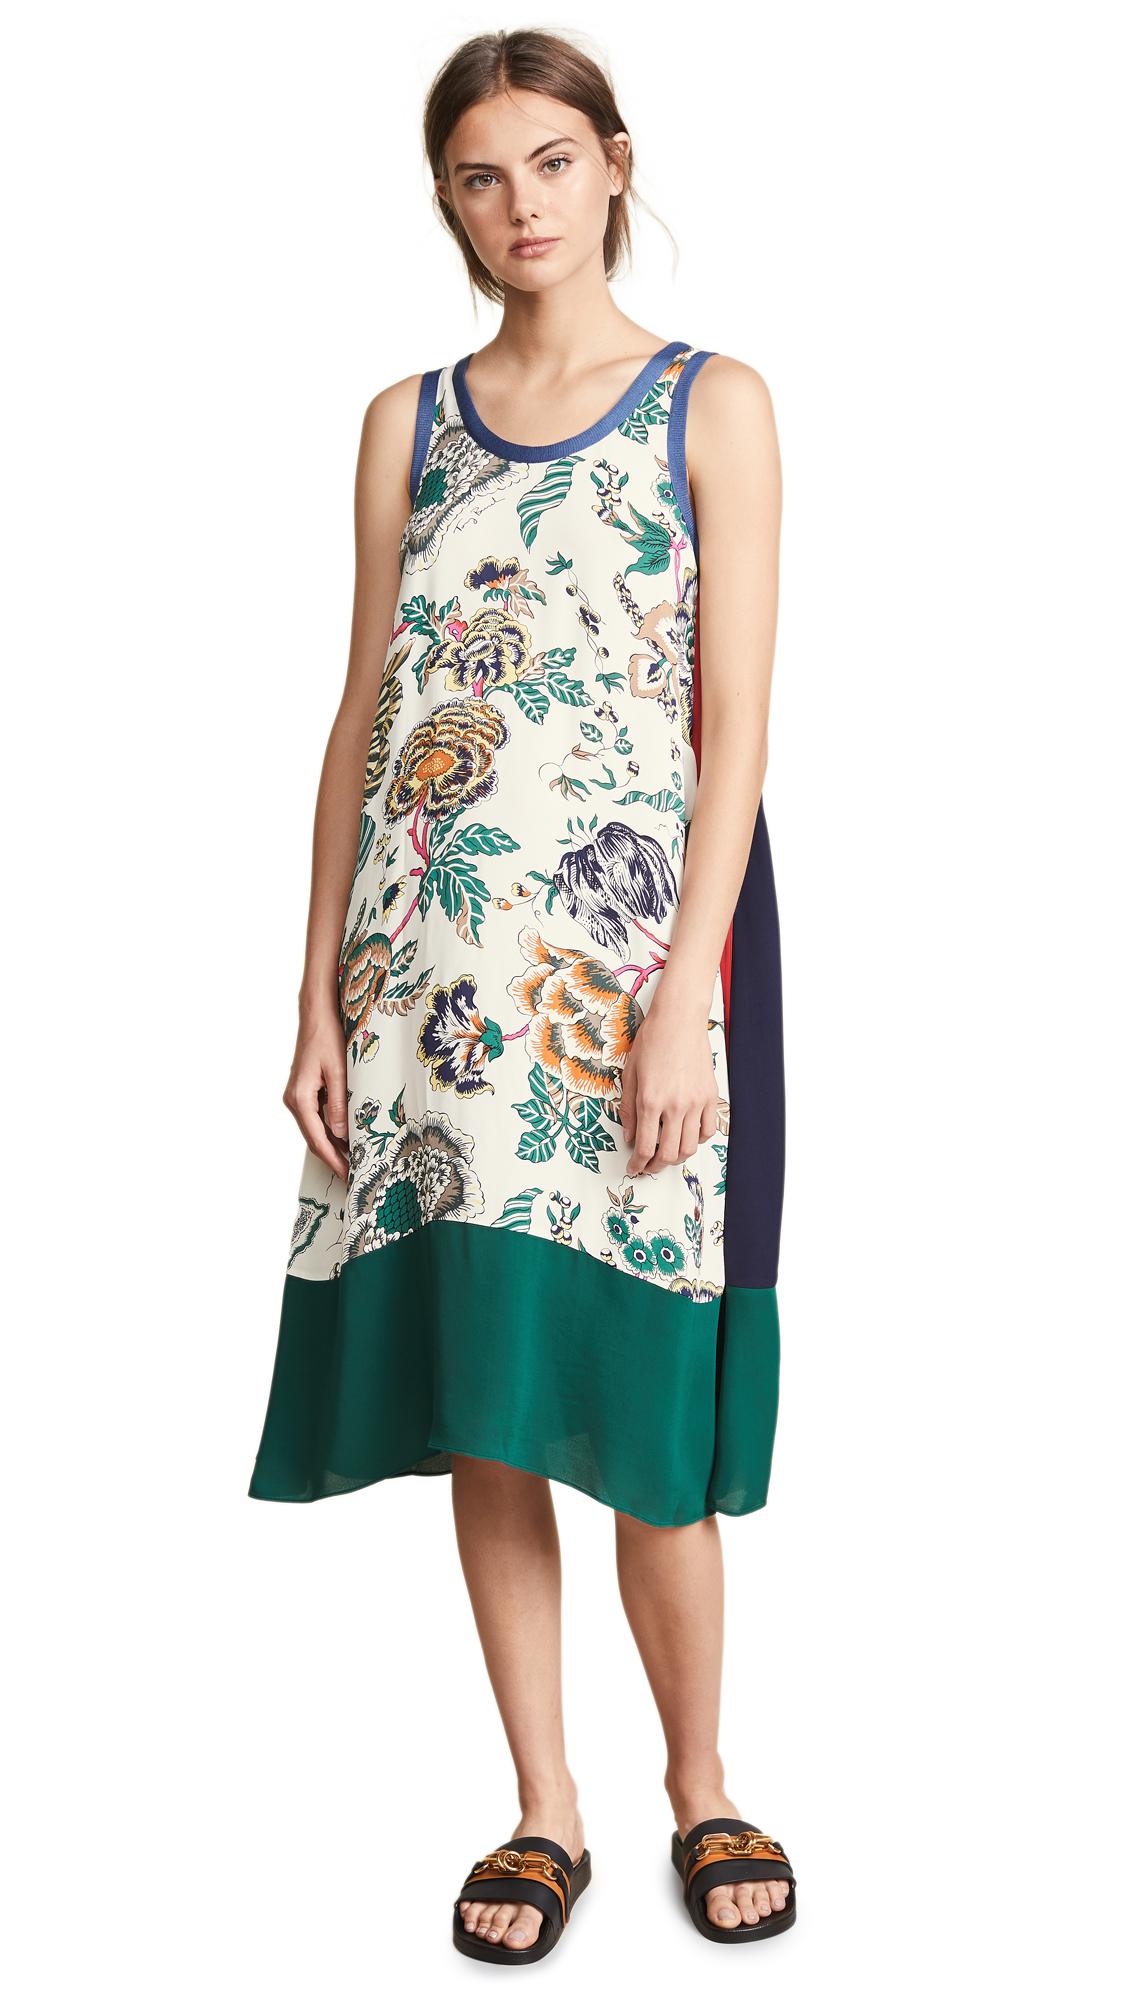 Tory Burch Rosie Dress